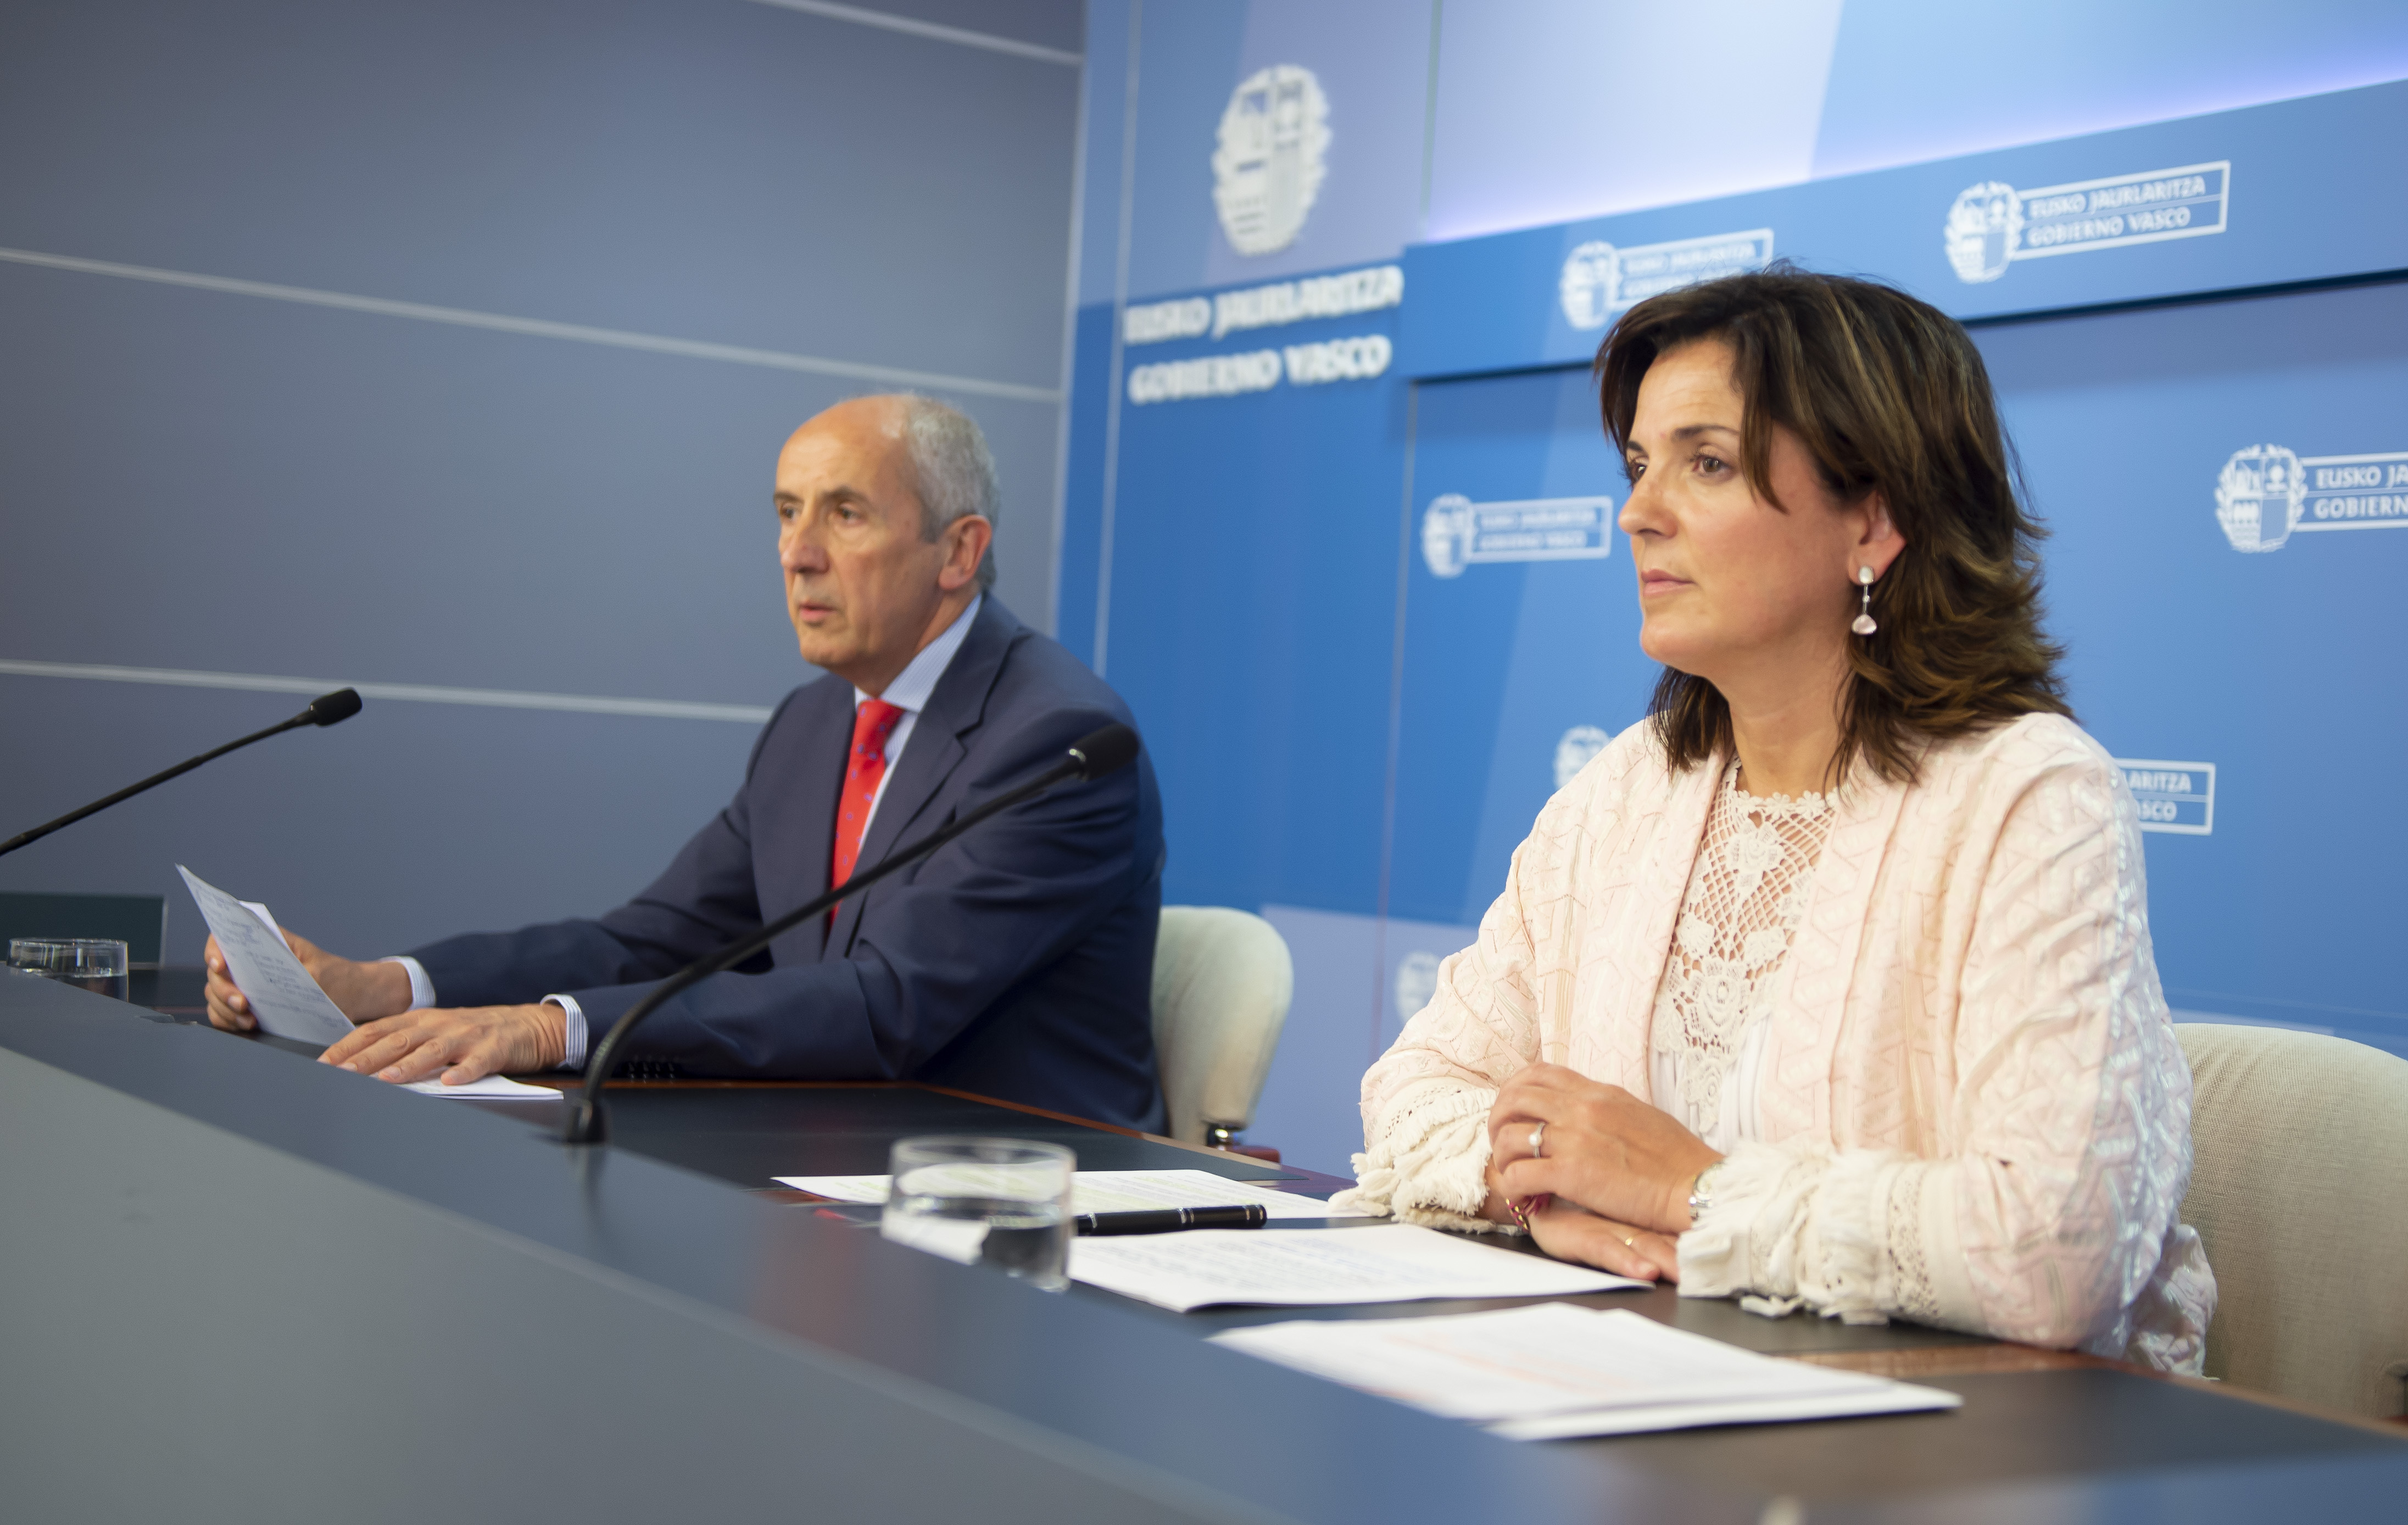 2019_07_02_consejo_gobierno_02.jpg